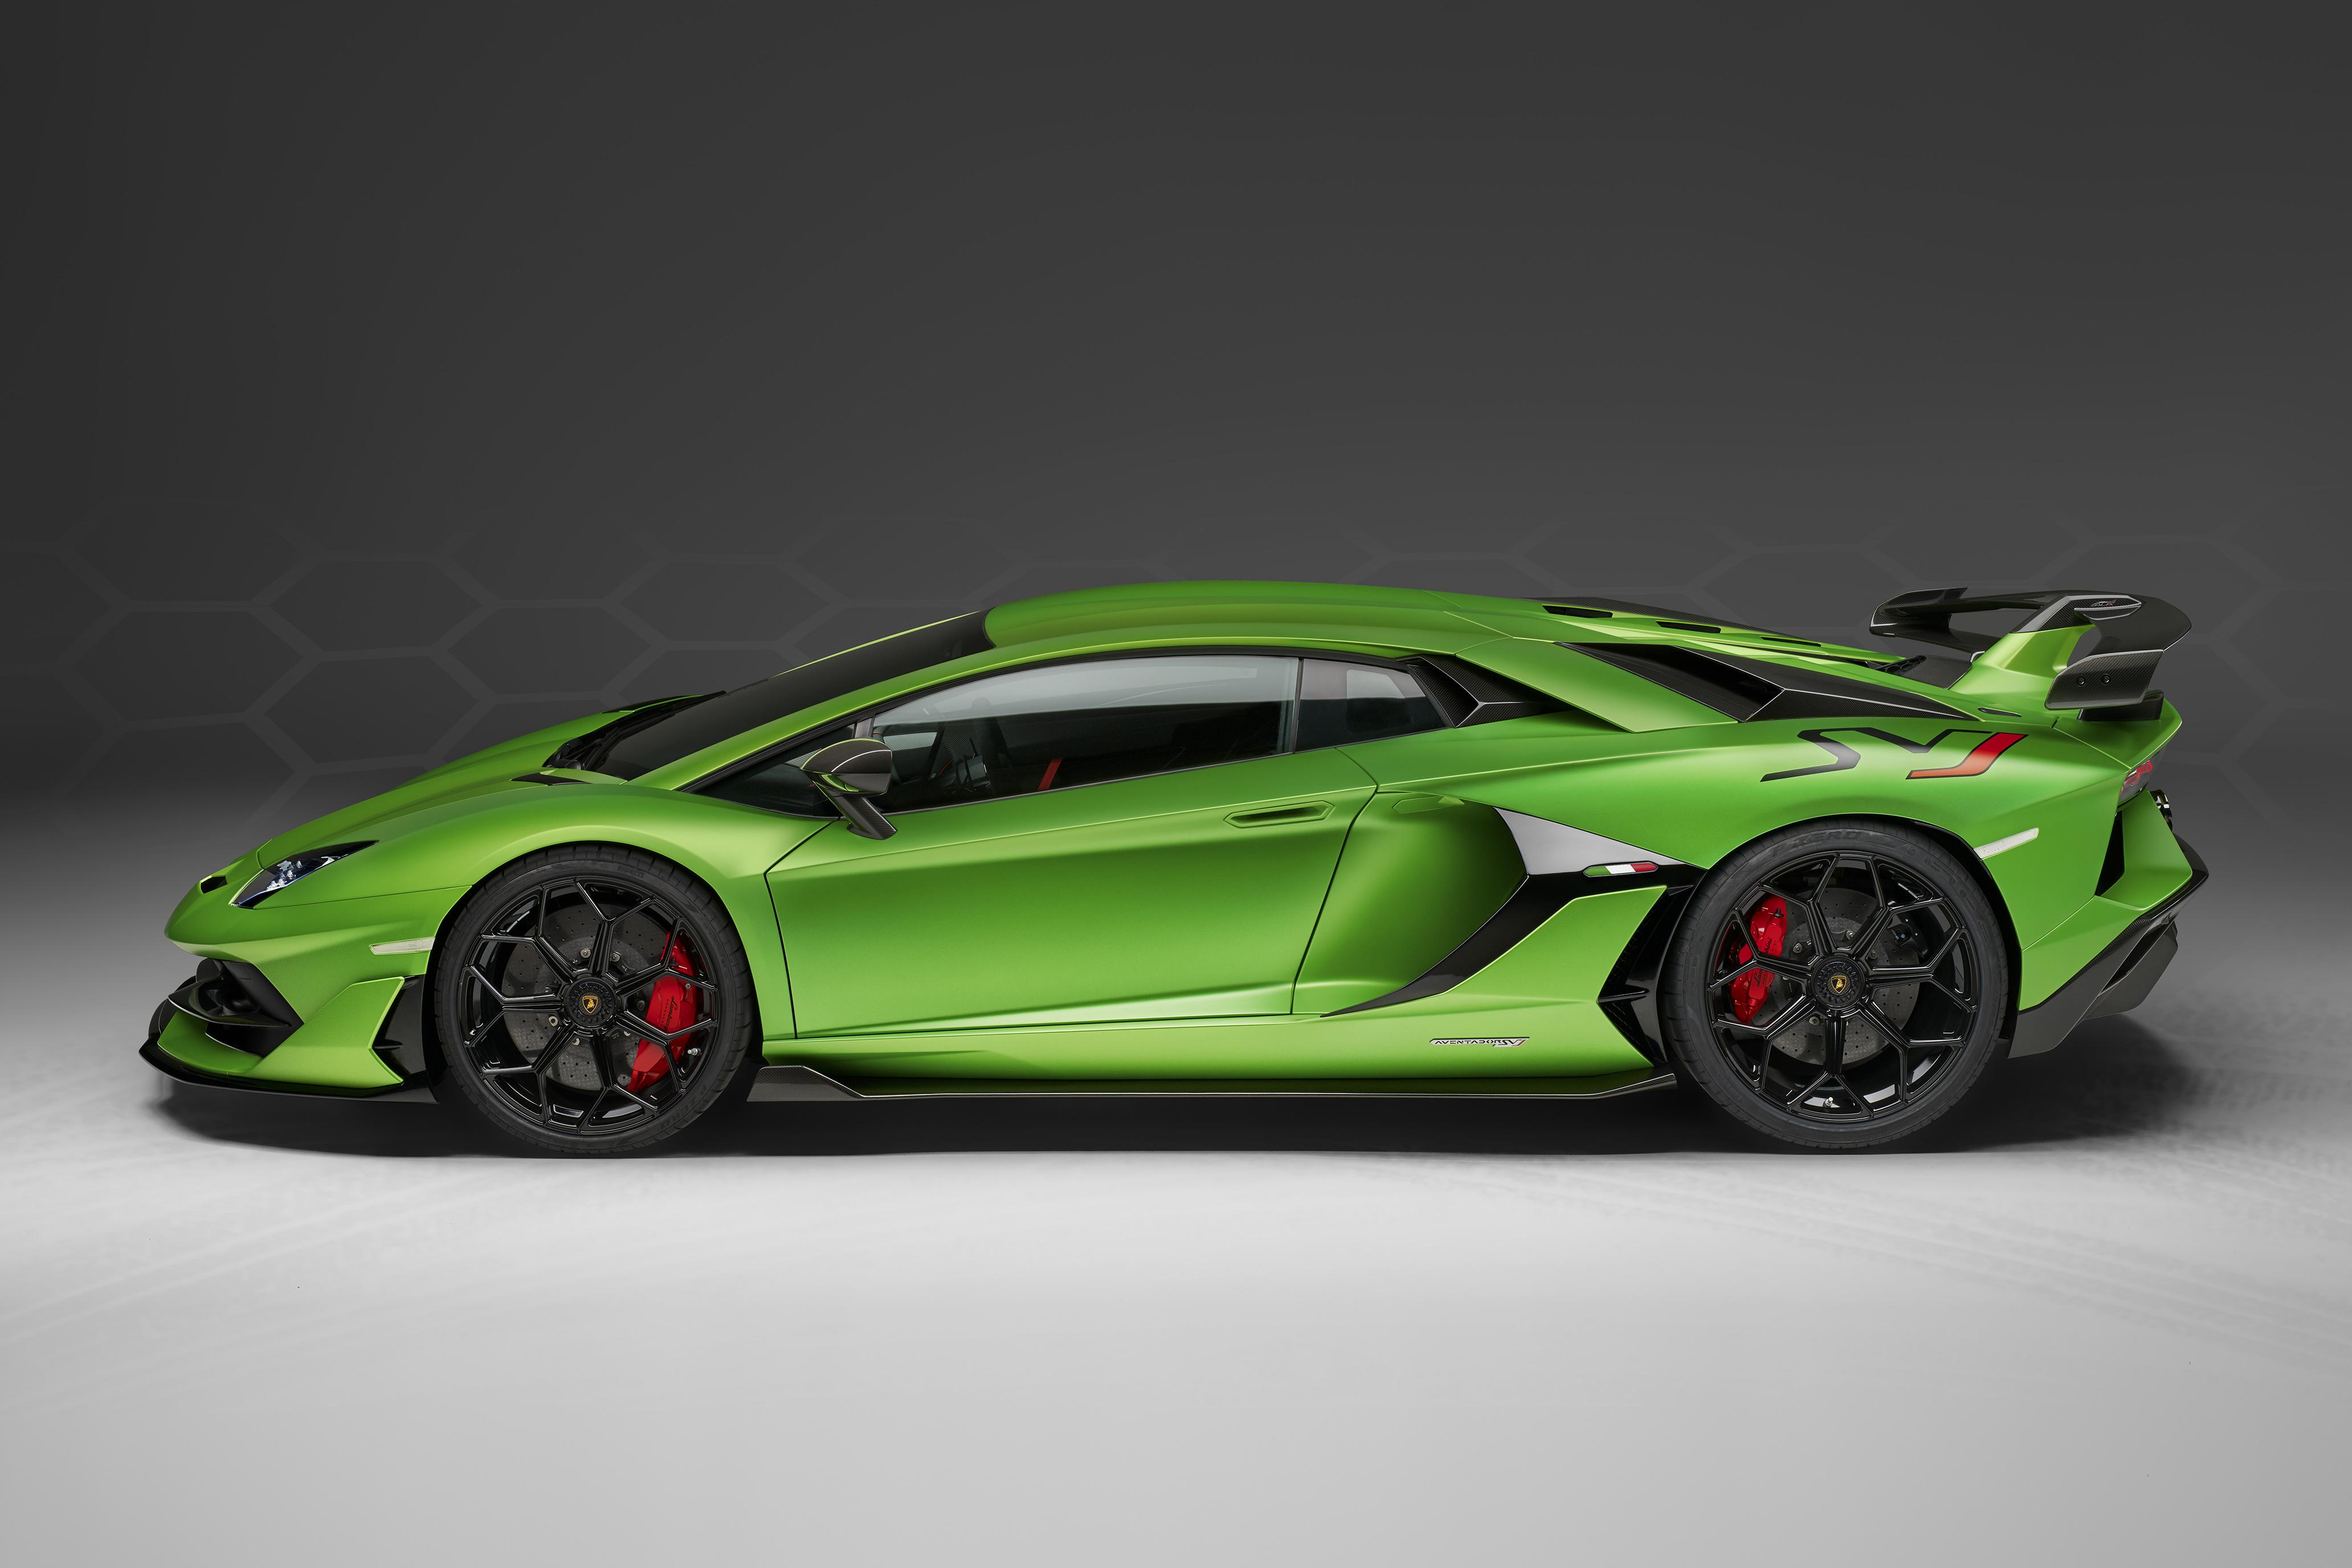 Lamborghini Aventador Svj Highline Autos Your Source